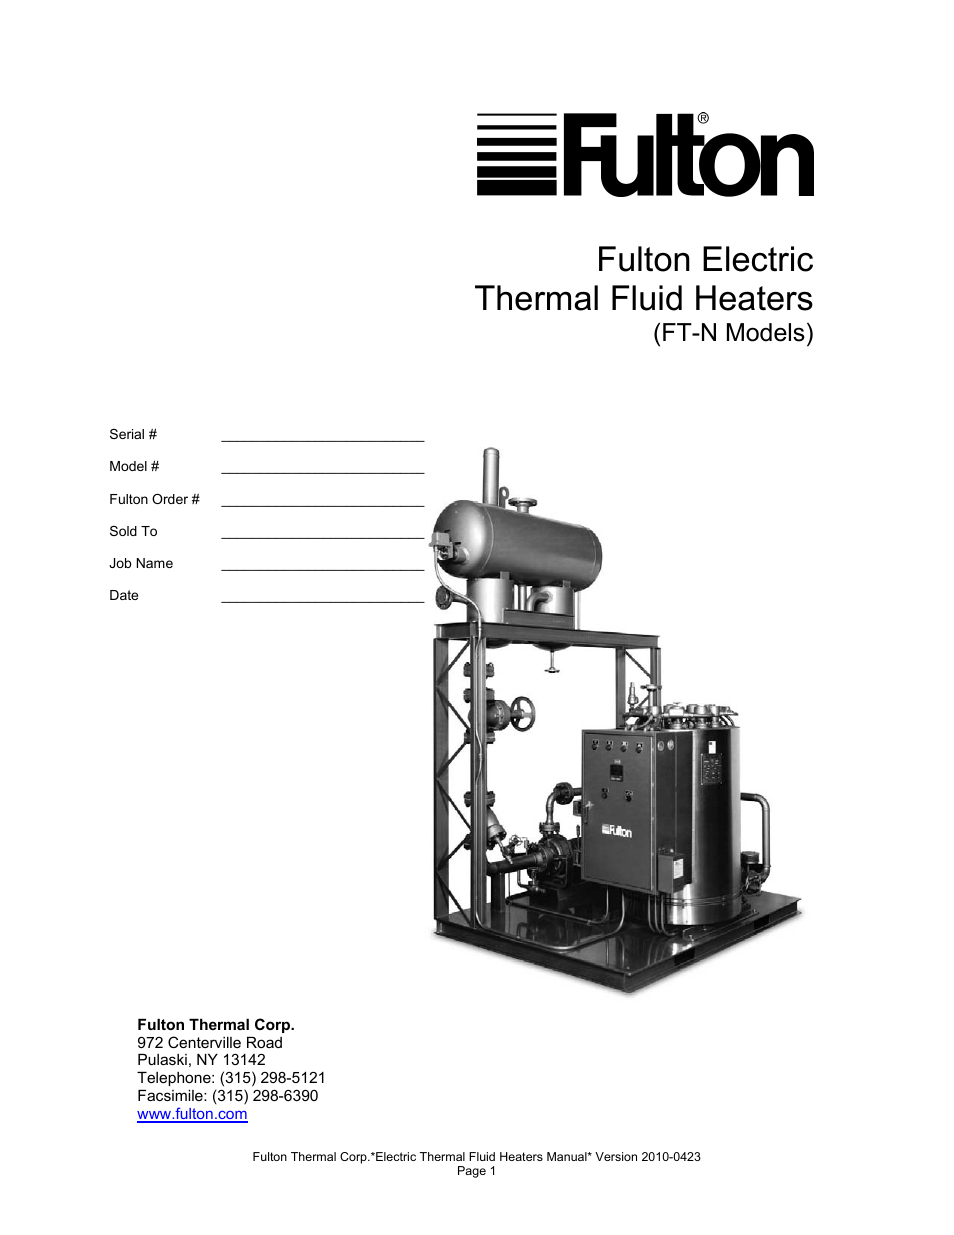 Fulton Vertical Electric (FT-N) Thermal Fluid (hot oil